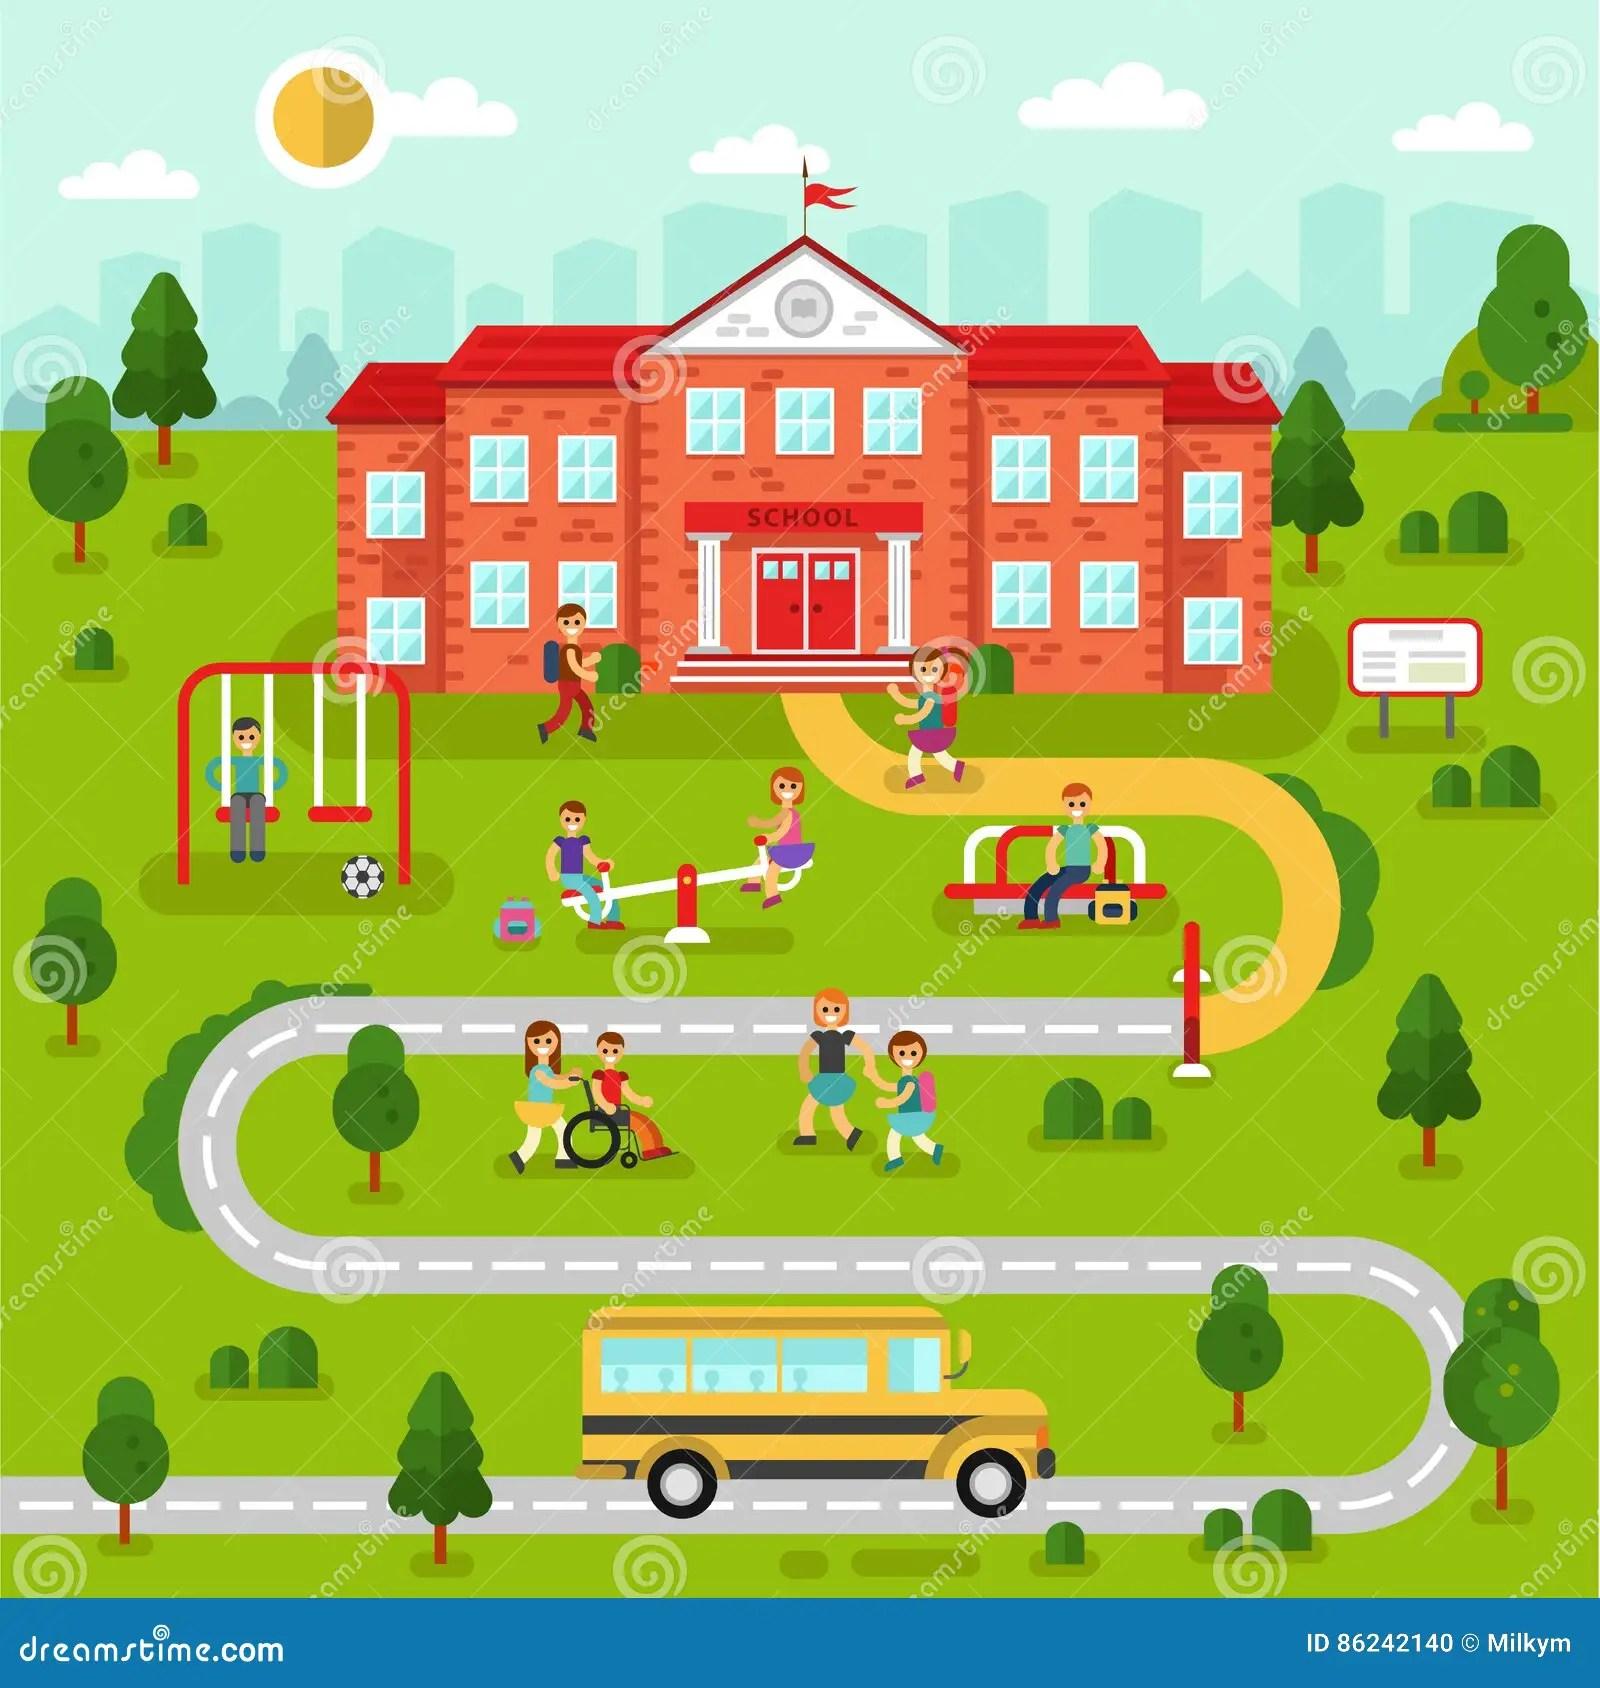 School Map Stock Vector Illustration Of Outdoor Concept